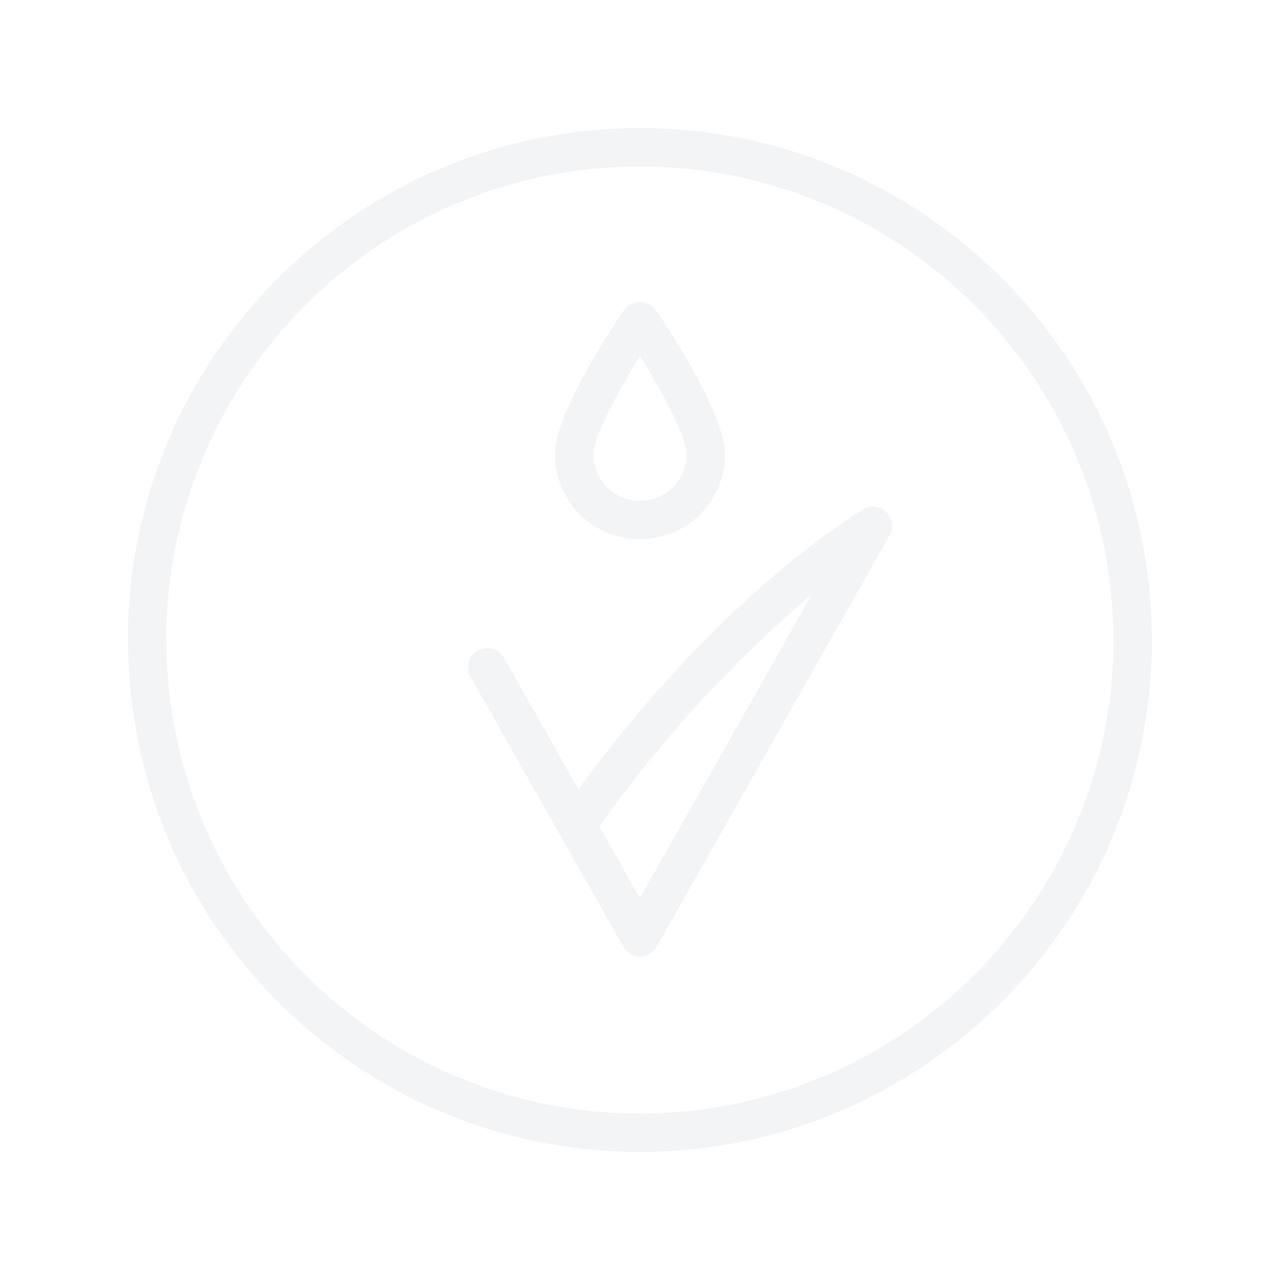 VICHY Slow Age Cream SPF30 укрепляющий крем 50ml